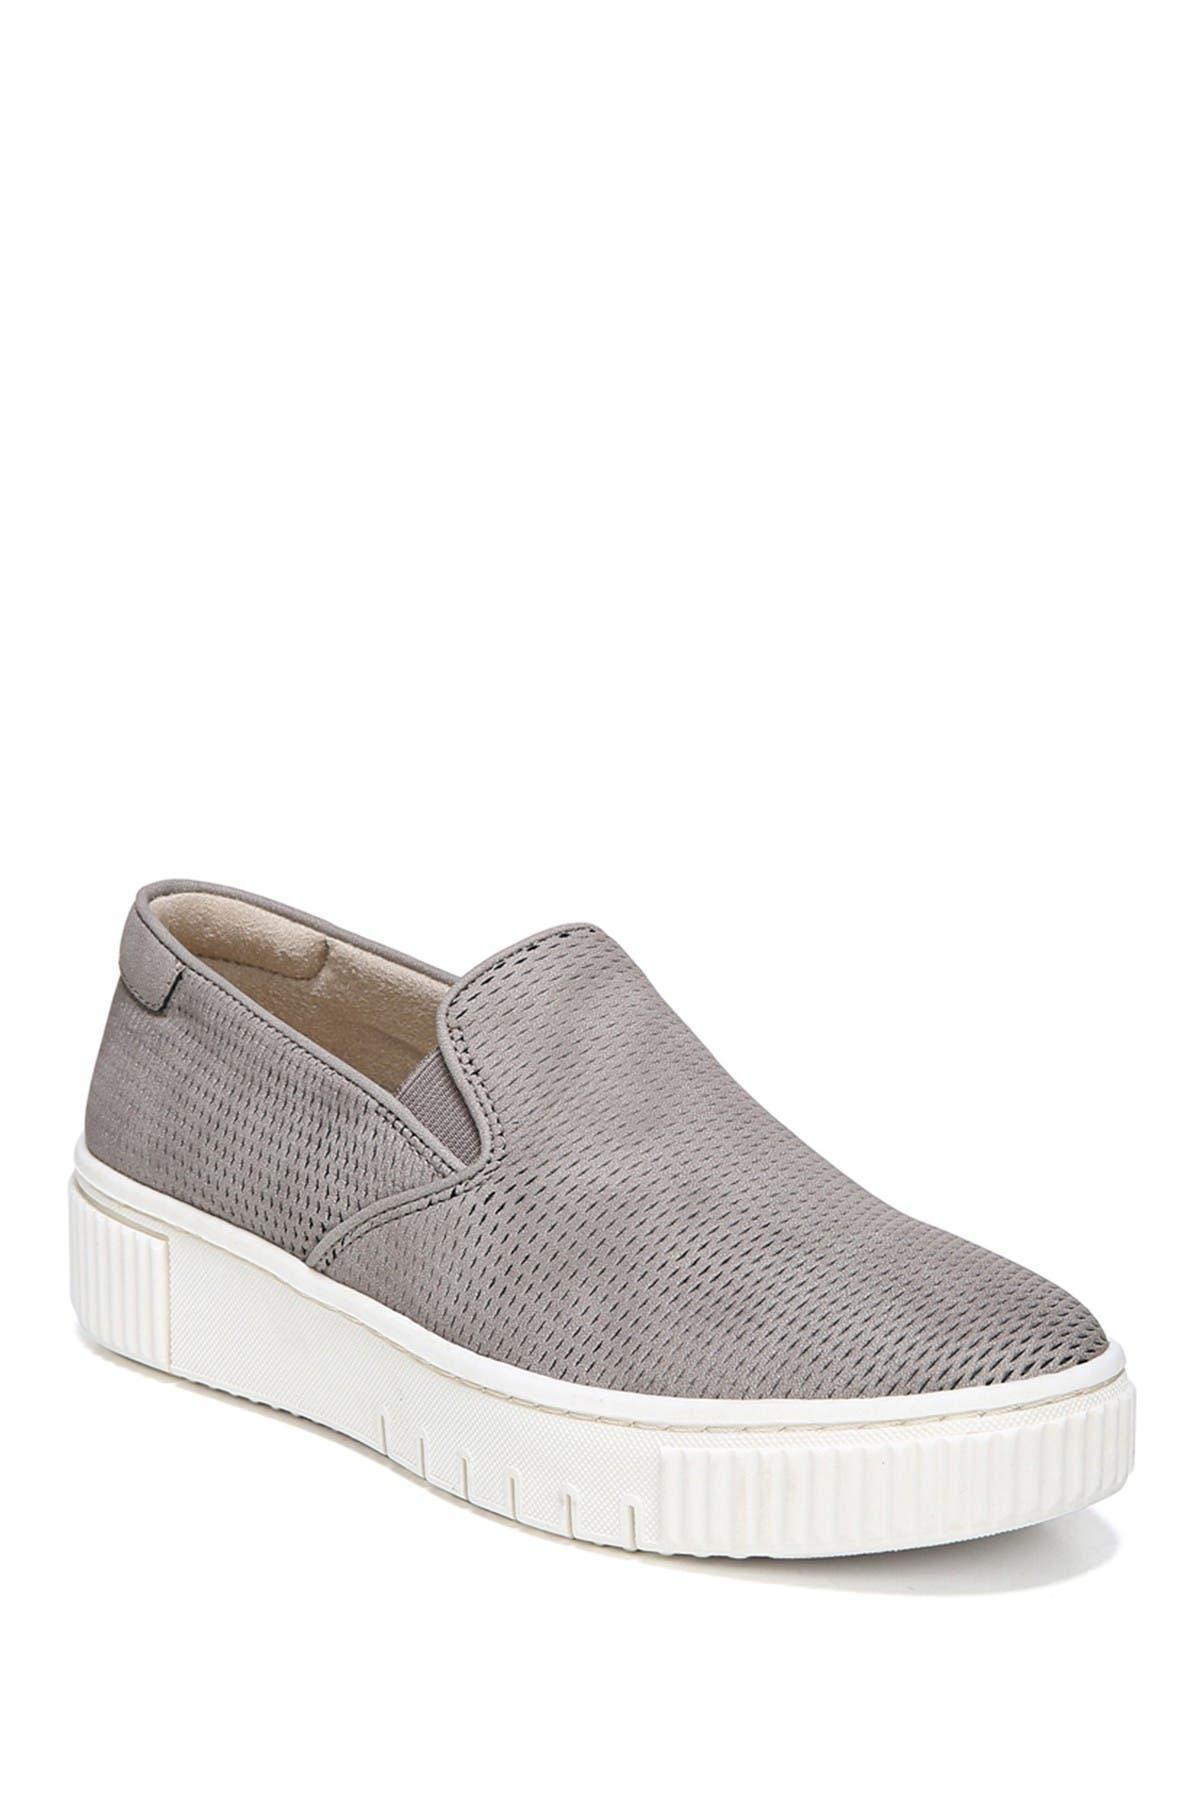 Image of SOUL Naturalizer Tia Platform Slip-On Sneaker